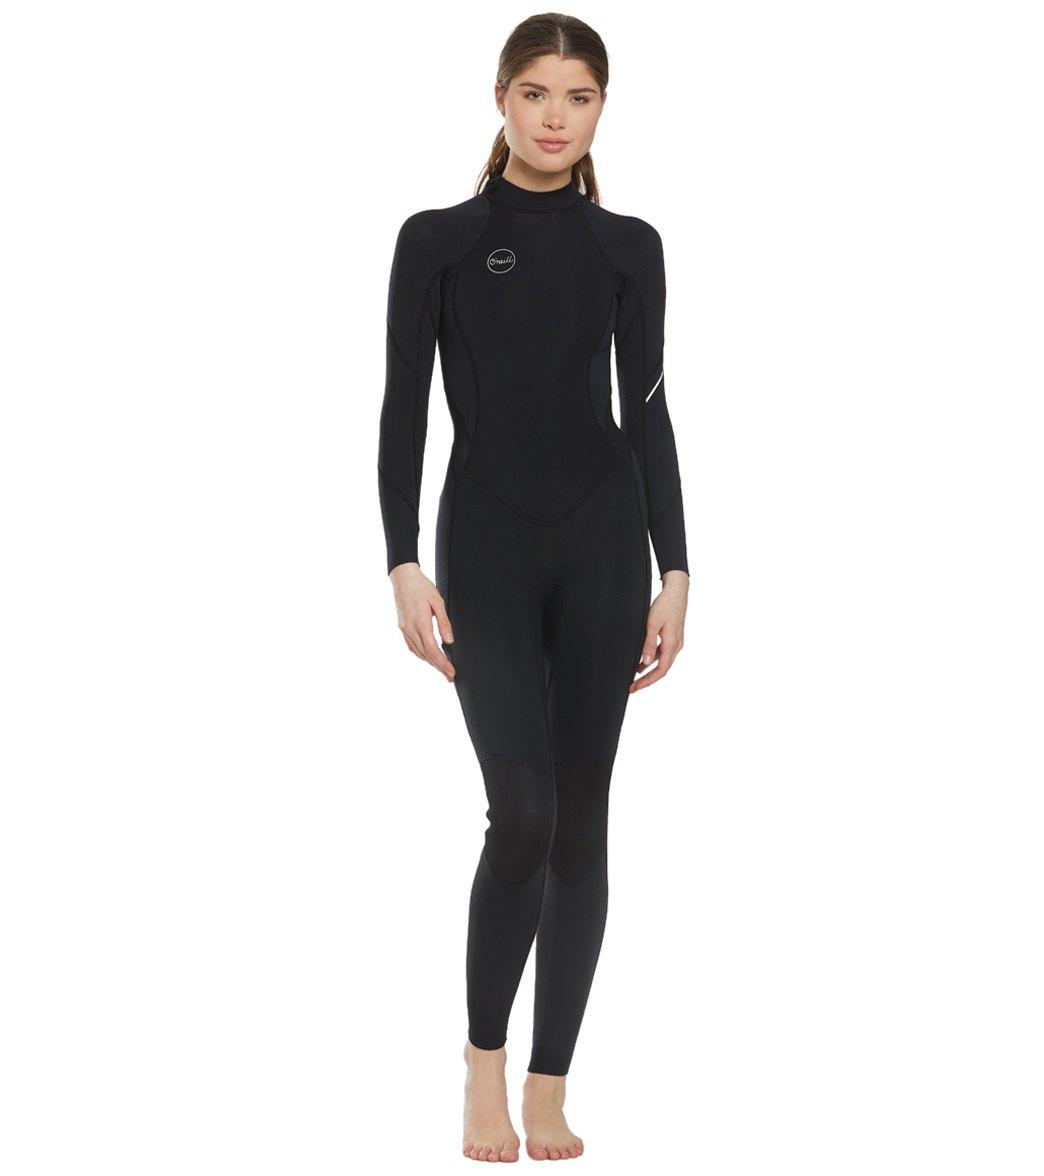 01b1331033 O Neill Women s Bahia 3 2mm Back Zip Fullsuit Wetsuit at SwimOutlet ...